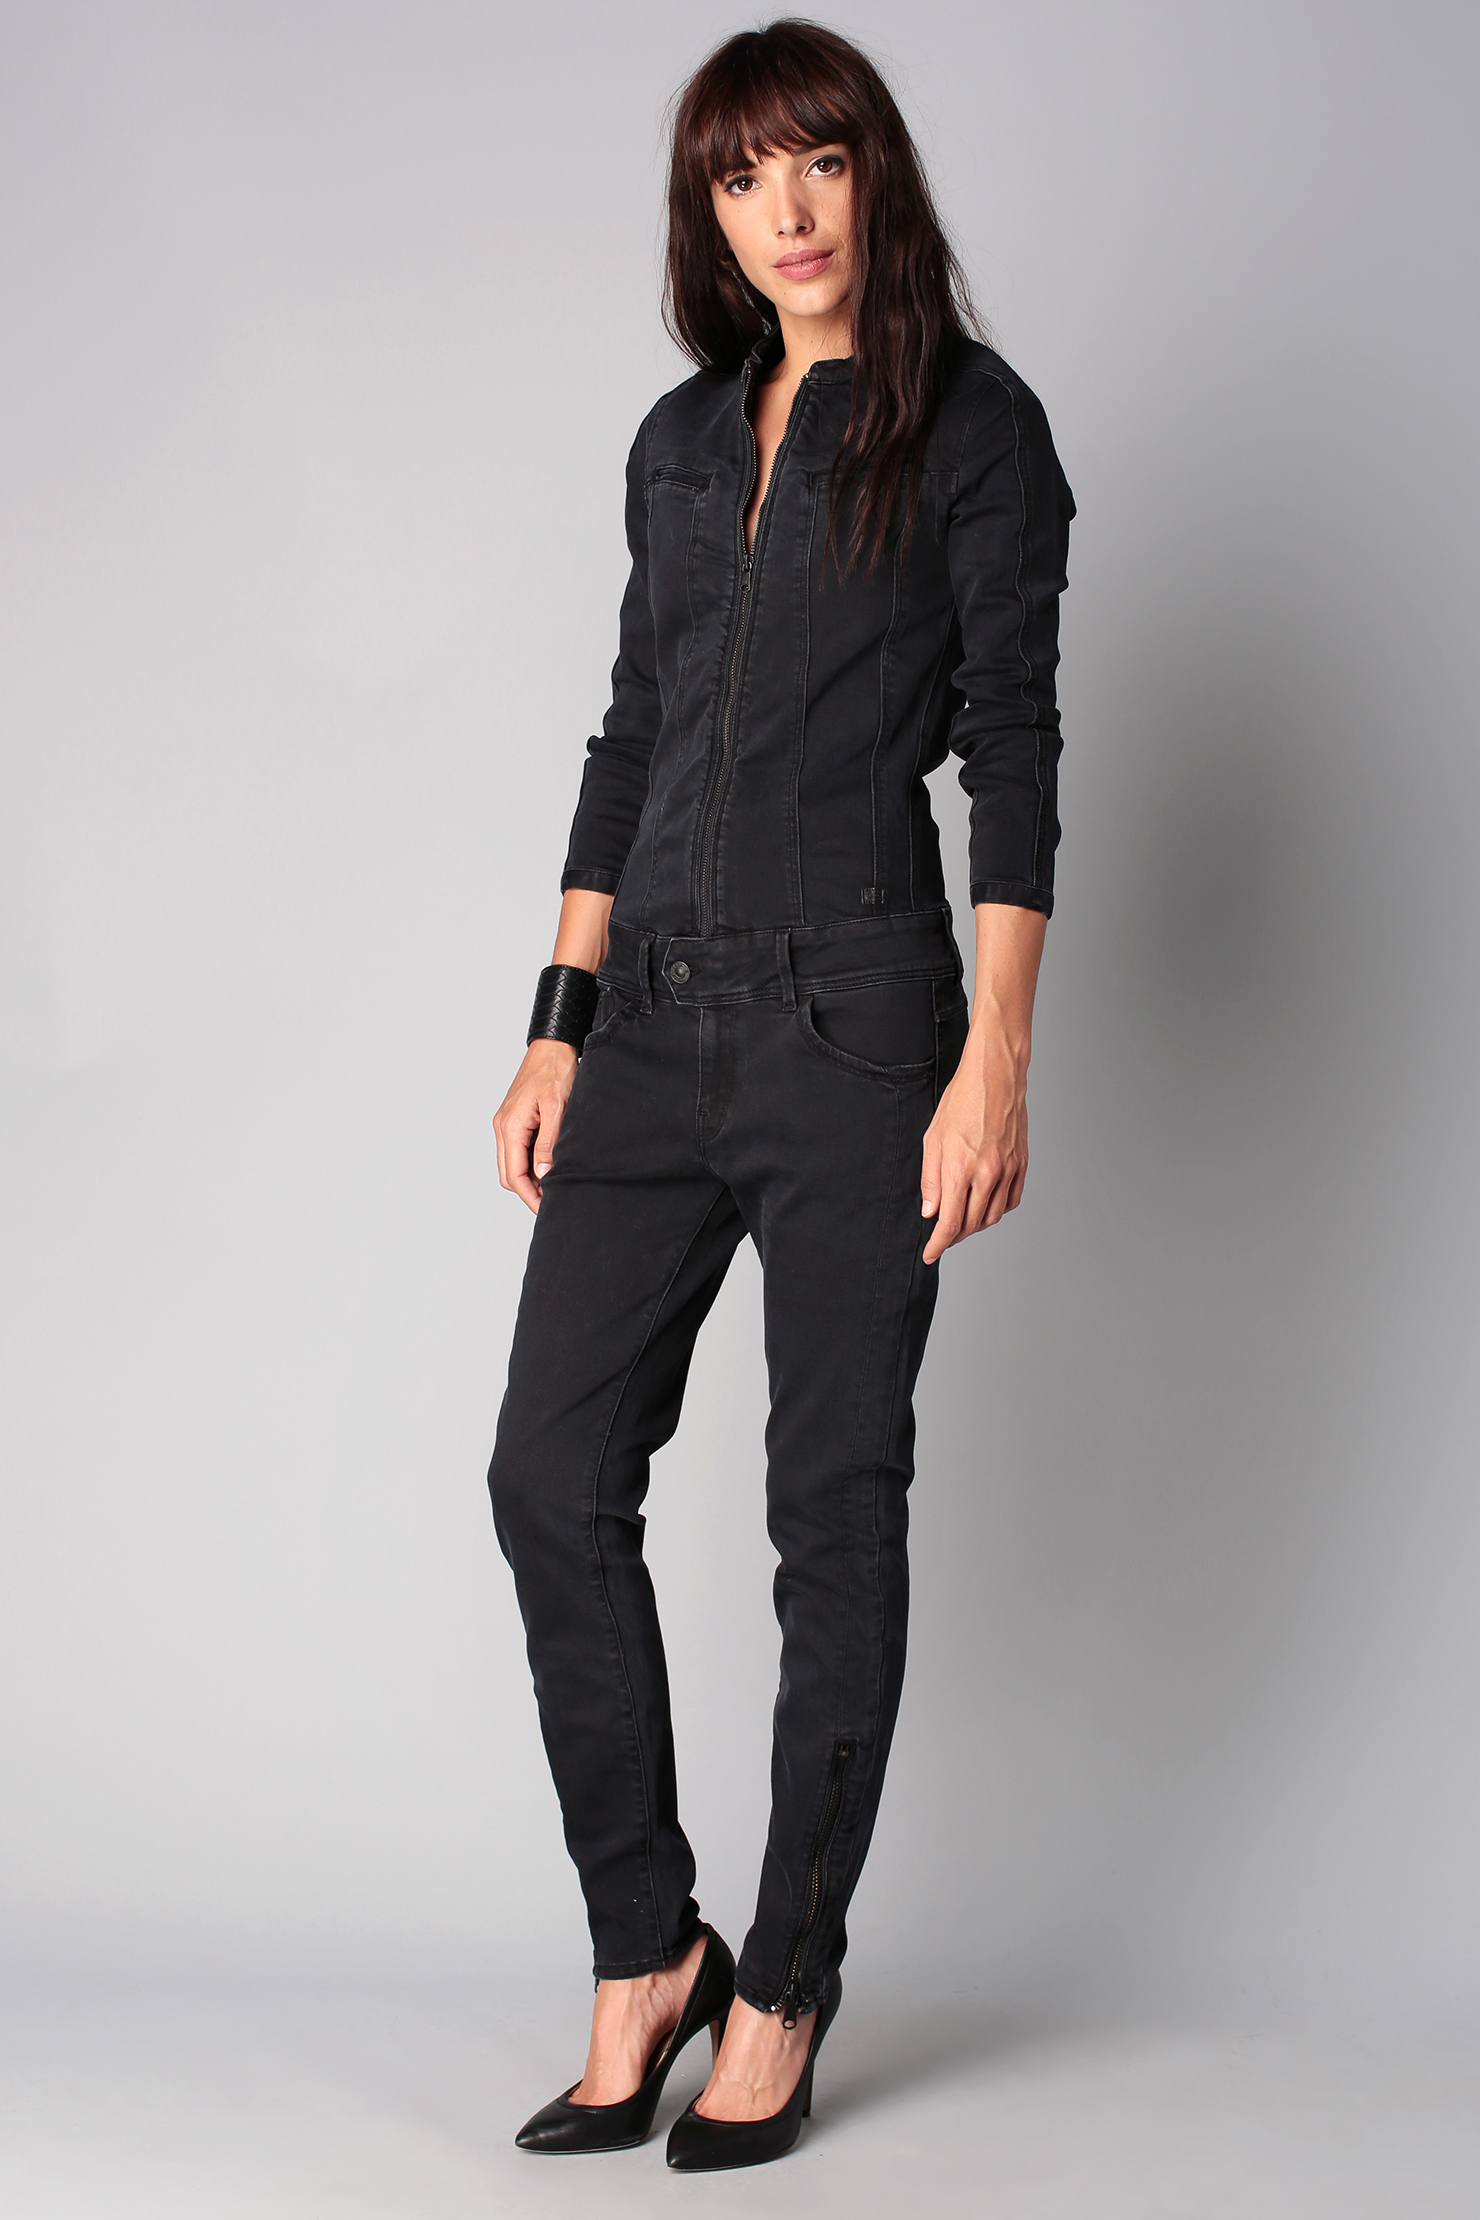 lyst g star raw jumpsuit in black. Black Bedroom Furniture Sets. Home Design Ideas